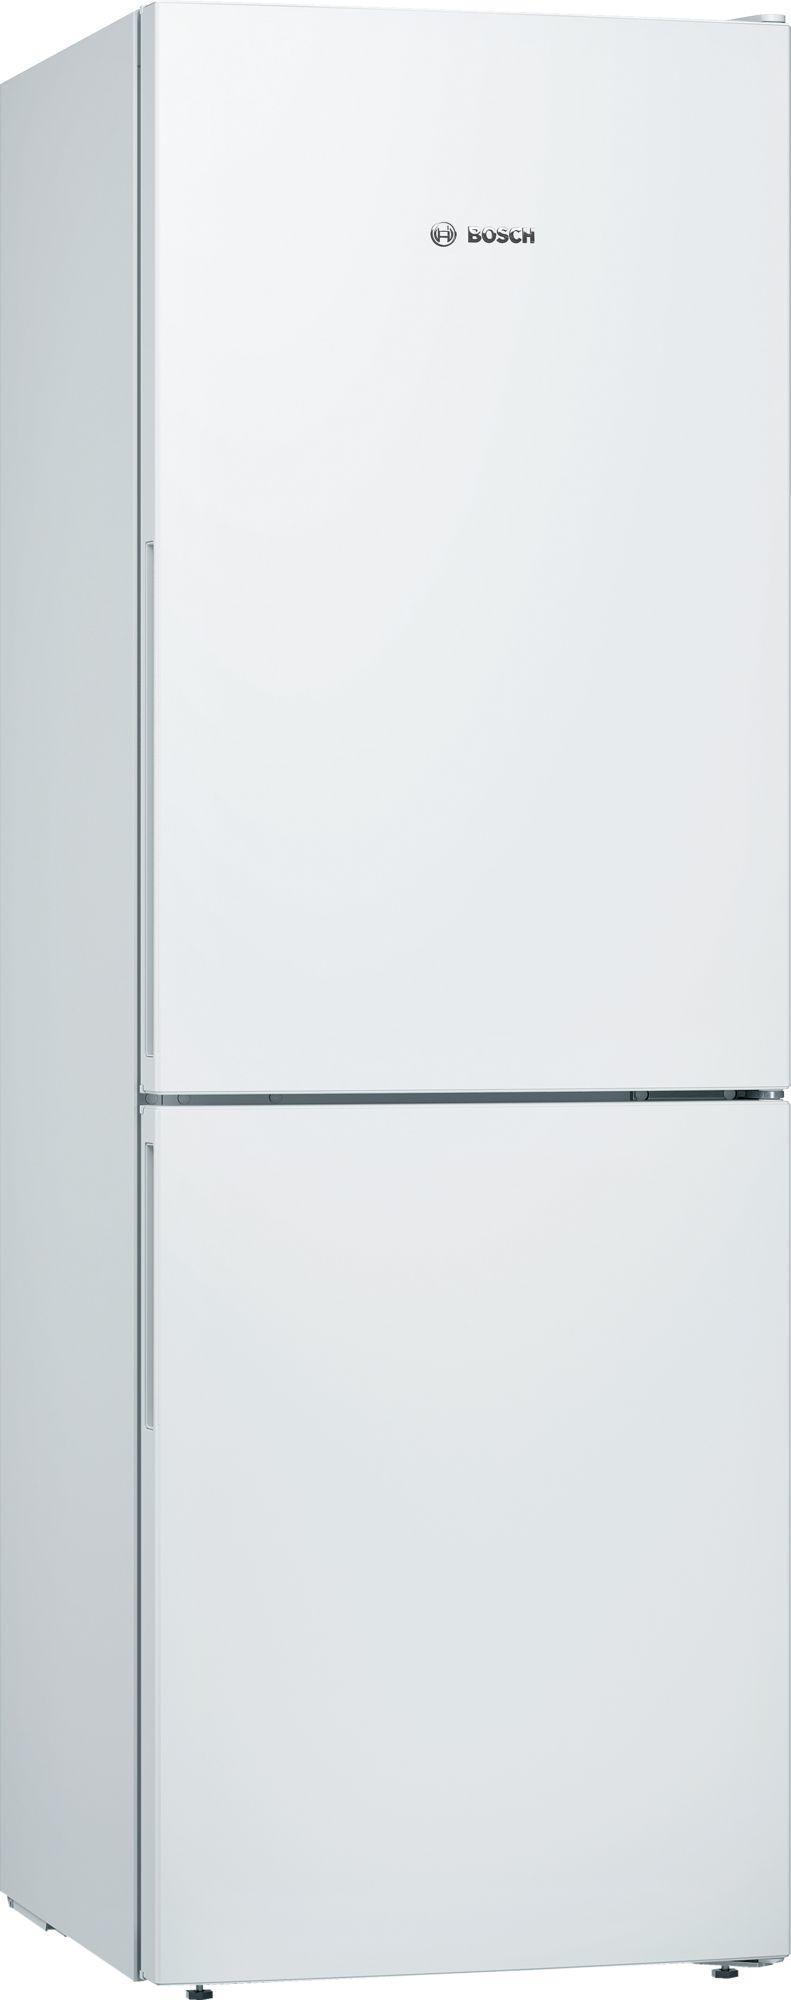 Image of Serie 4 KGV336WEAG 60cm 287 Litre A++ Low Frost Fridge Freezer | White